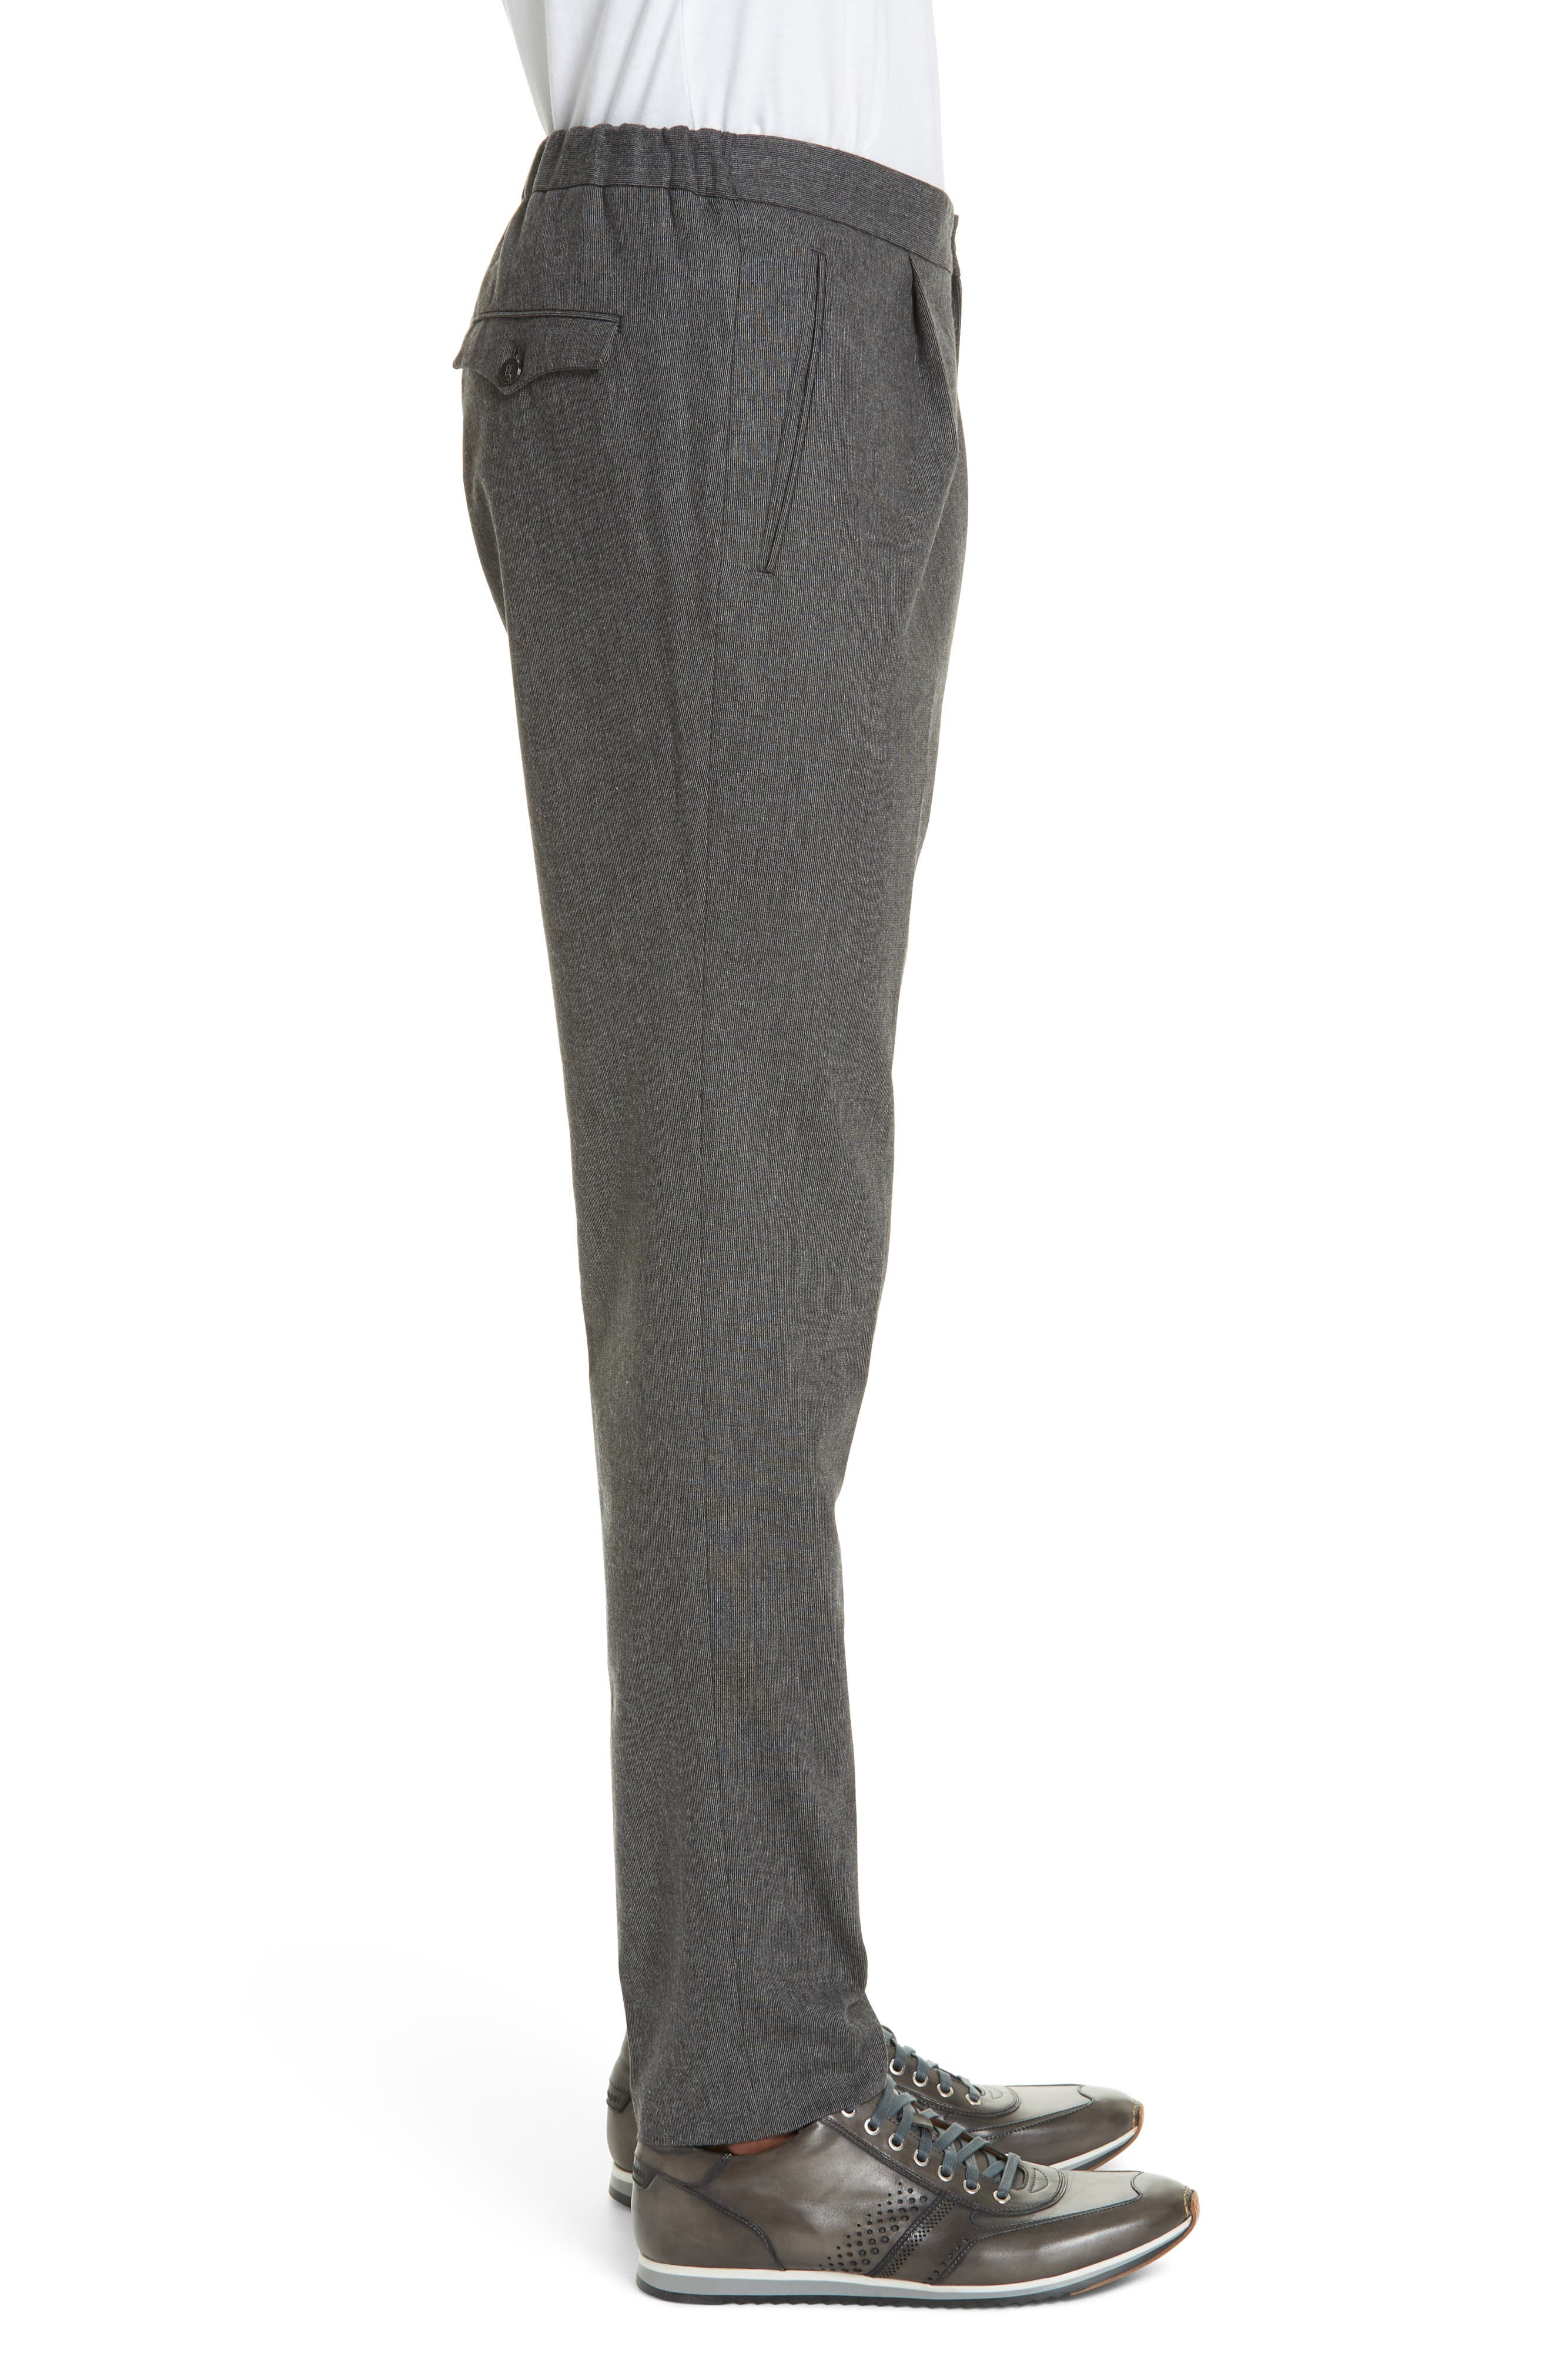 Trim Fit Sport Trousers,                             Alternate thumbnail 3, color,                             CHARCOAL